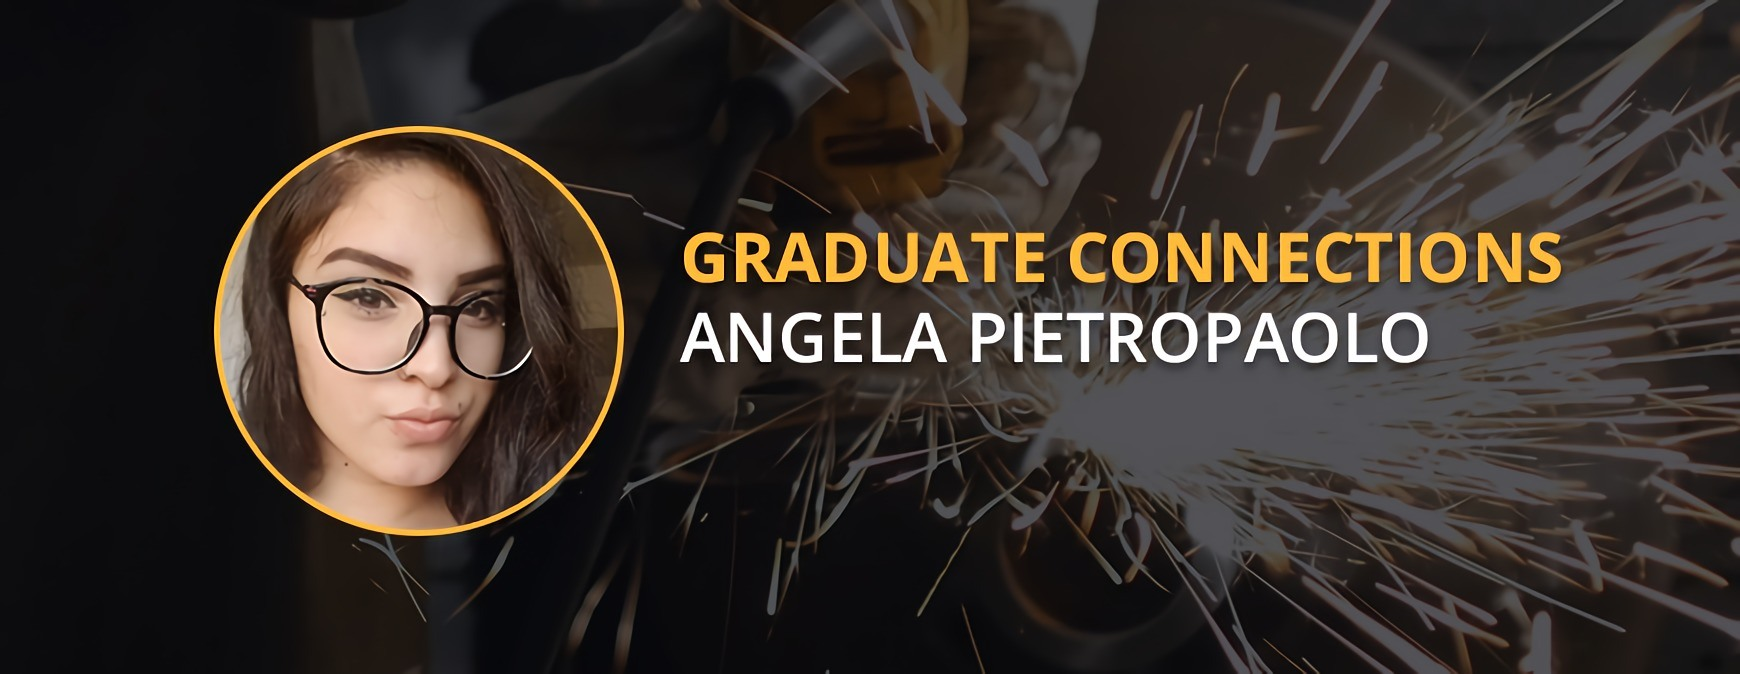 Angela Pietropaolo